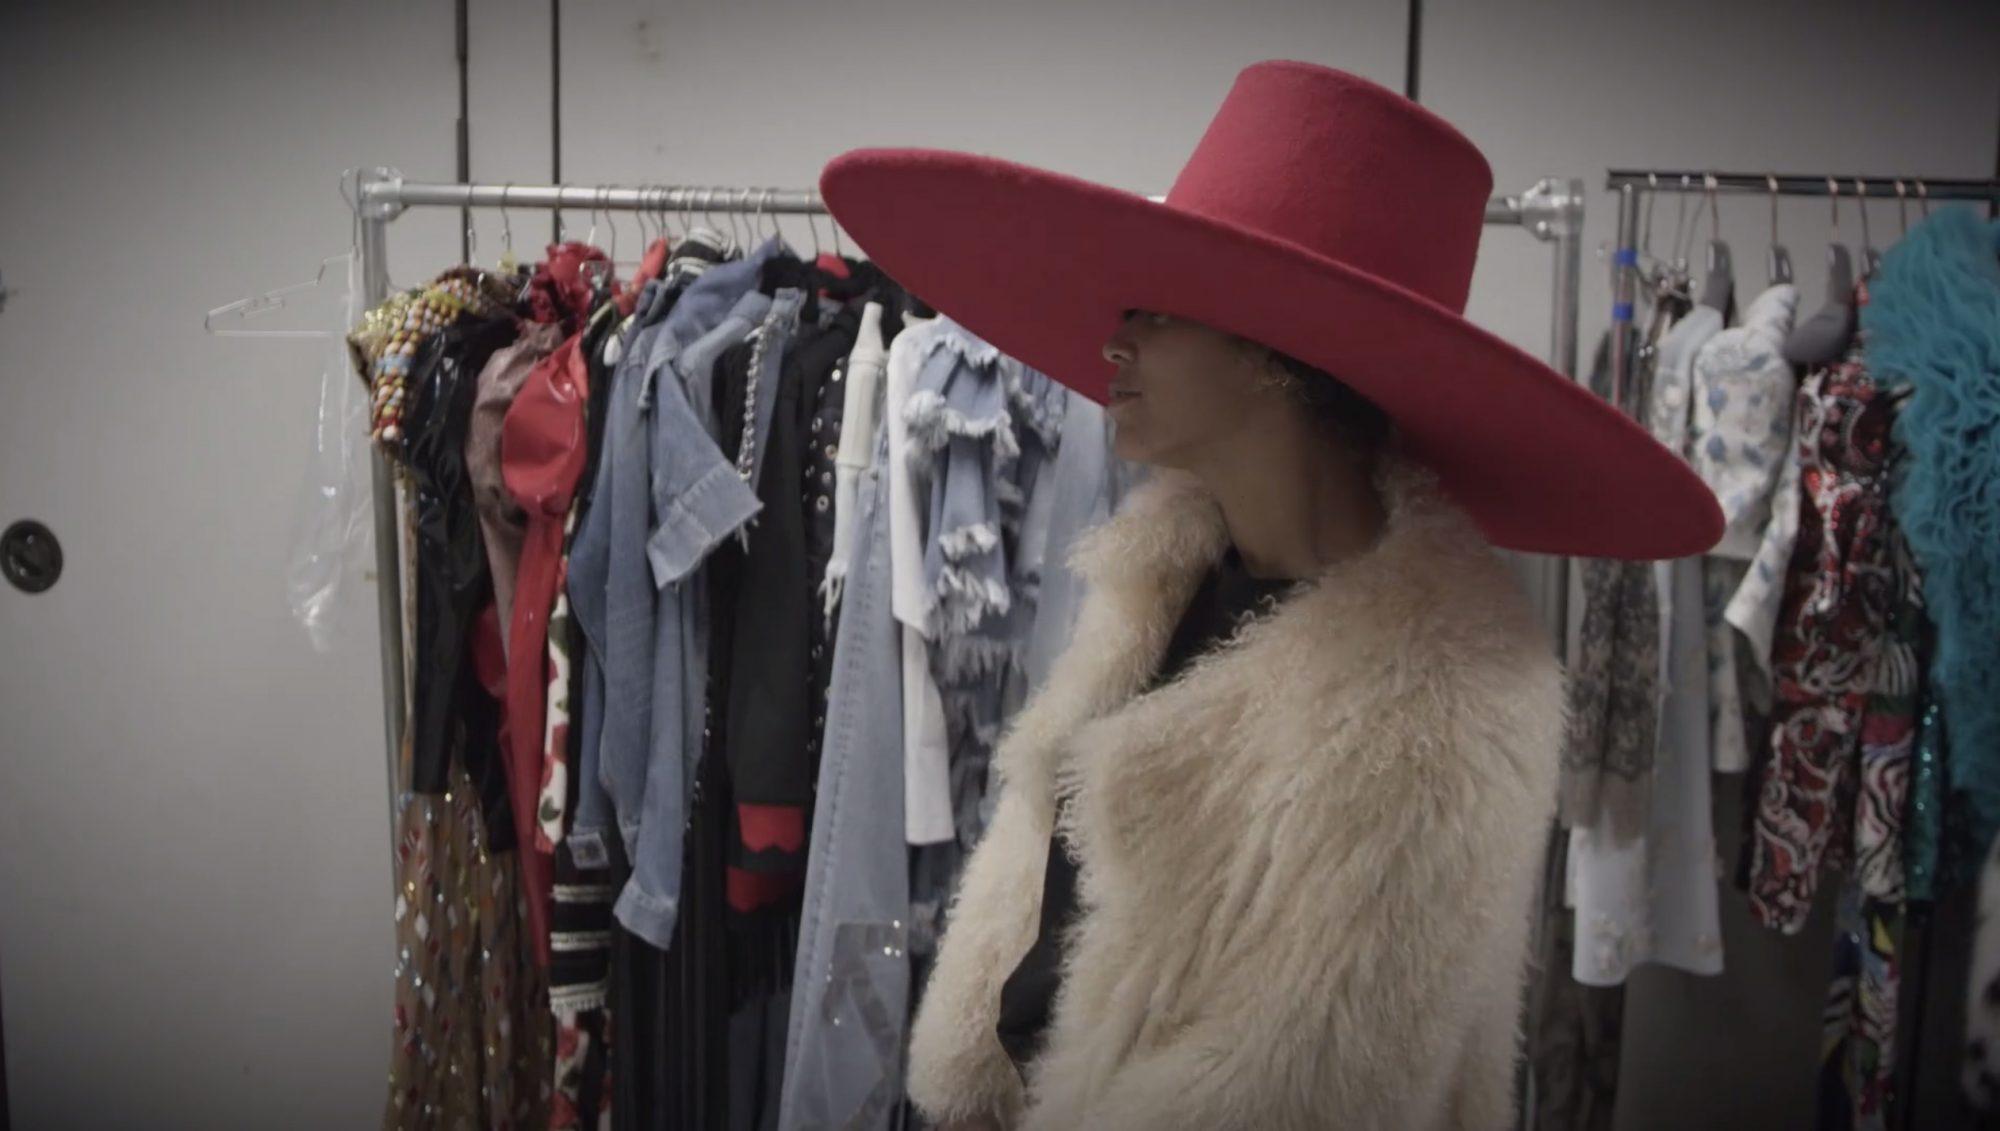 beyonce-formation-tour-wardrobe.jpg